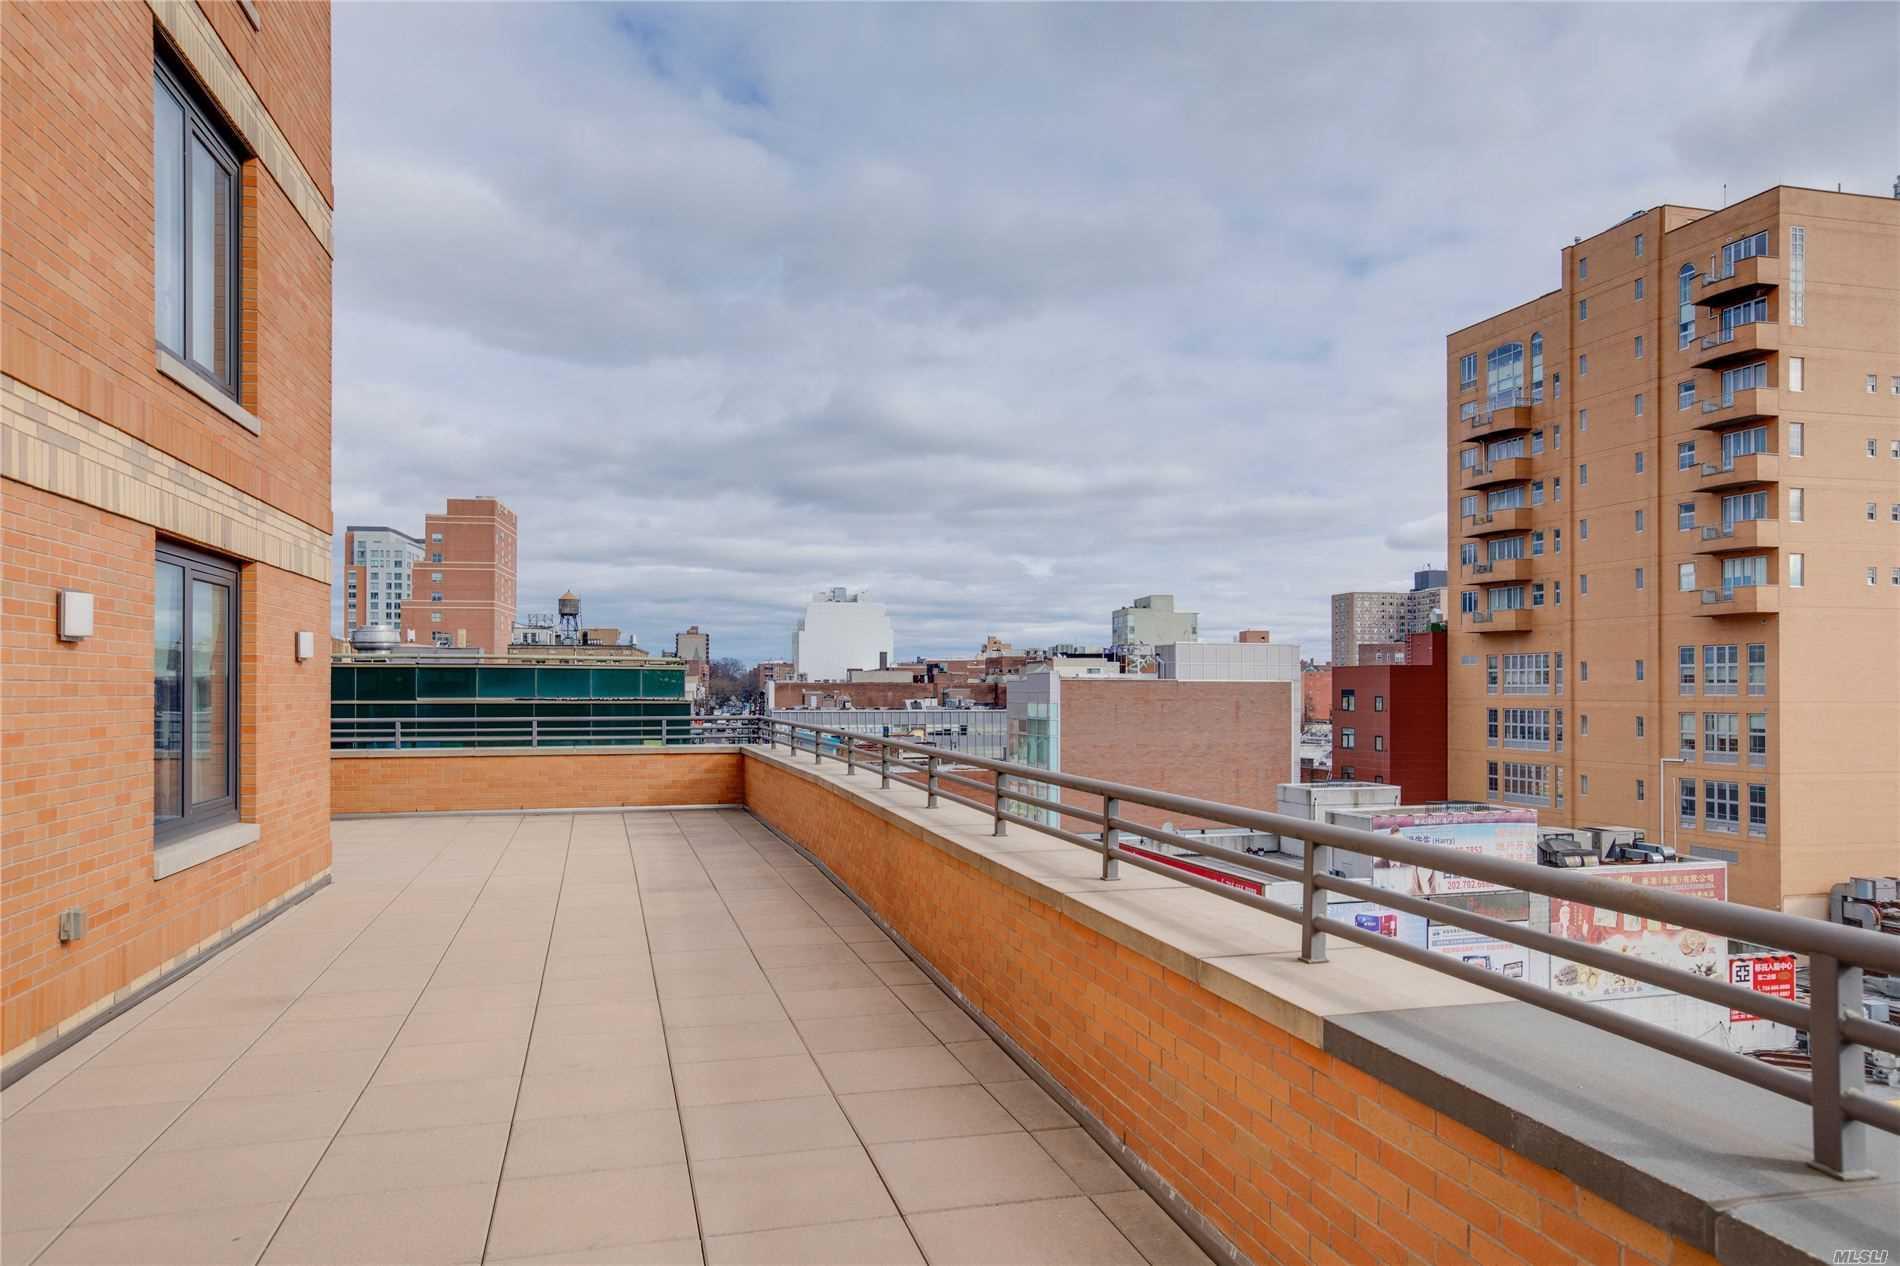 Property for sale at 39-16 Prince Street # 5B, Flushing NY 11354, Flushing,  New York 11354